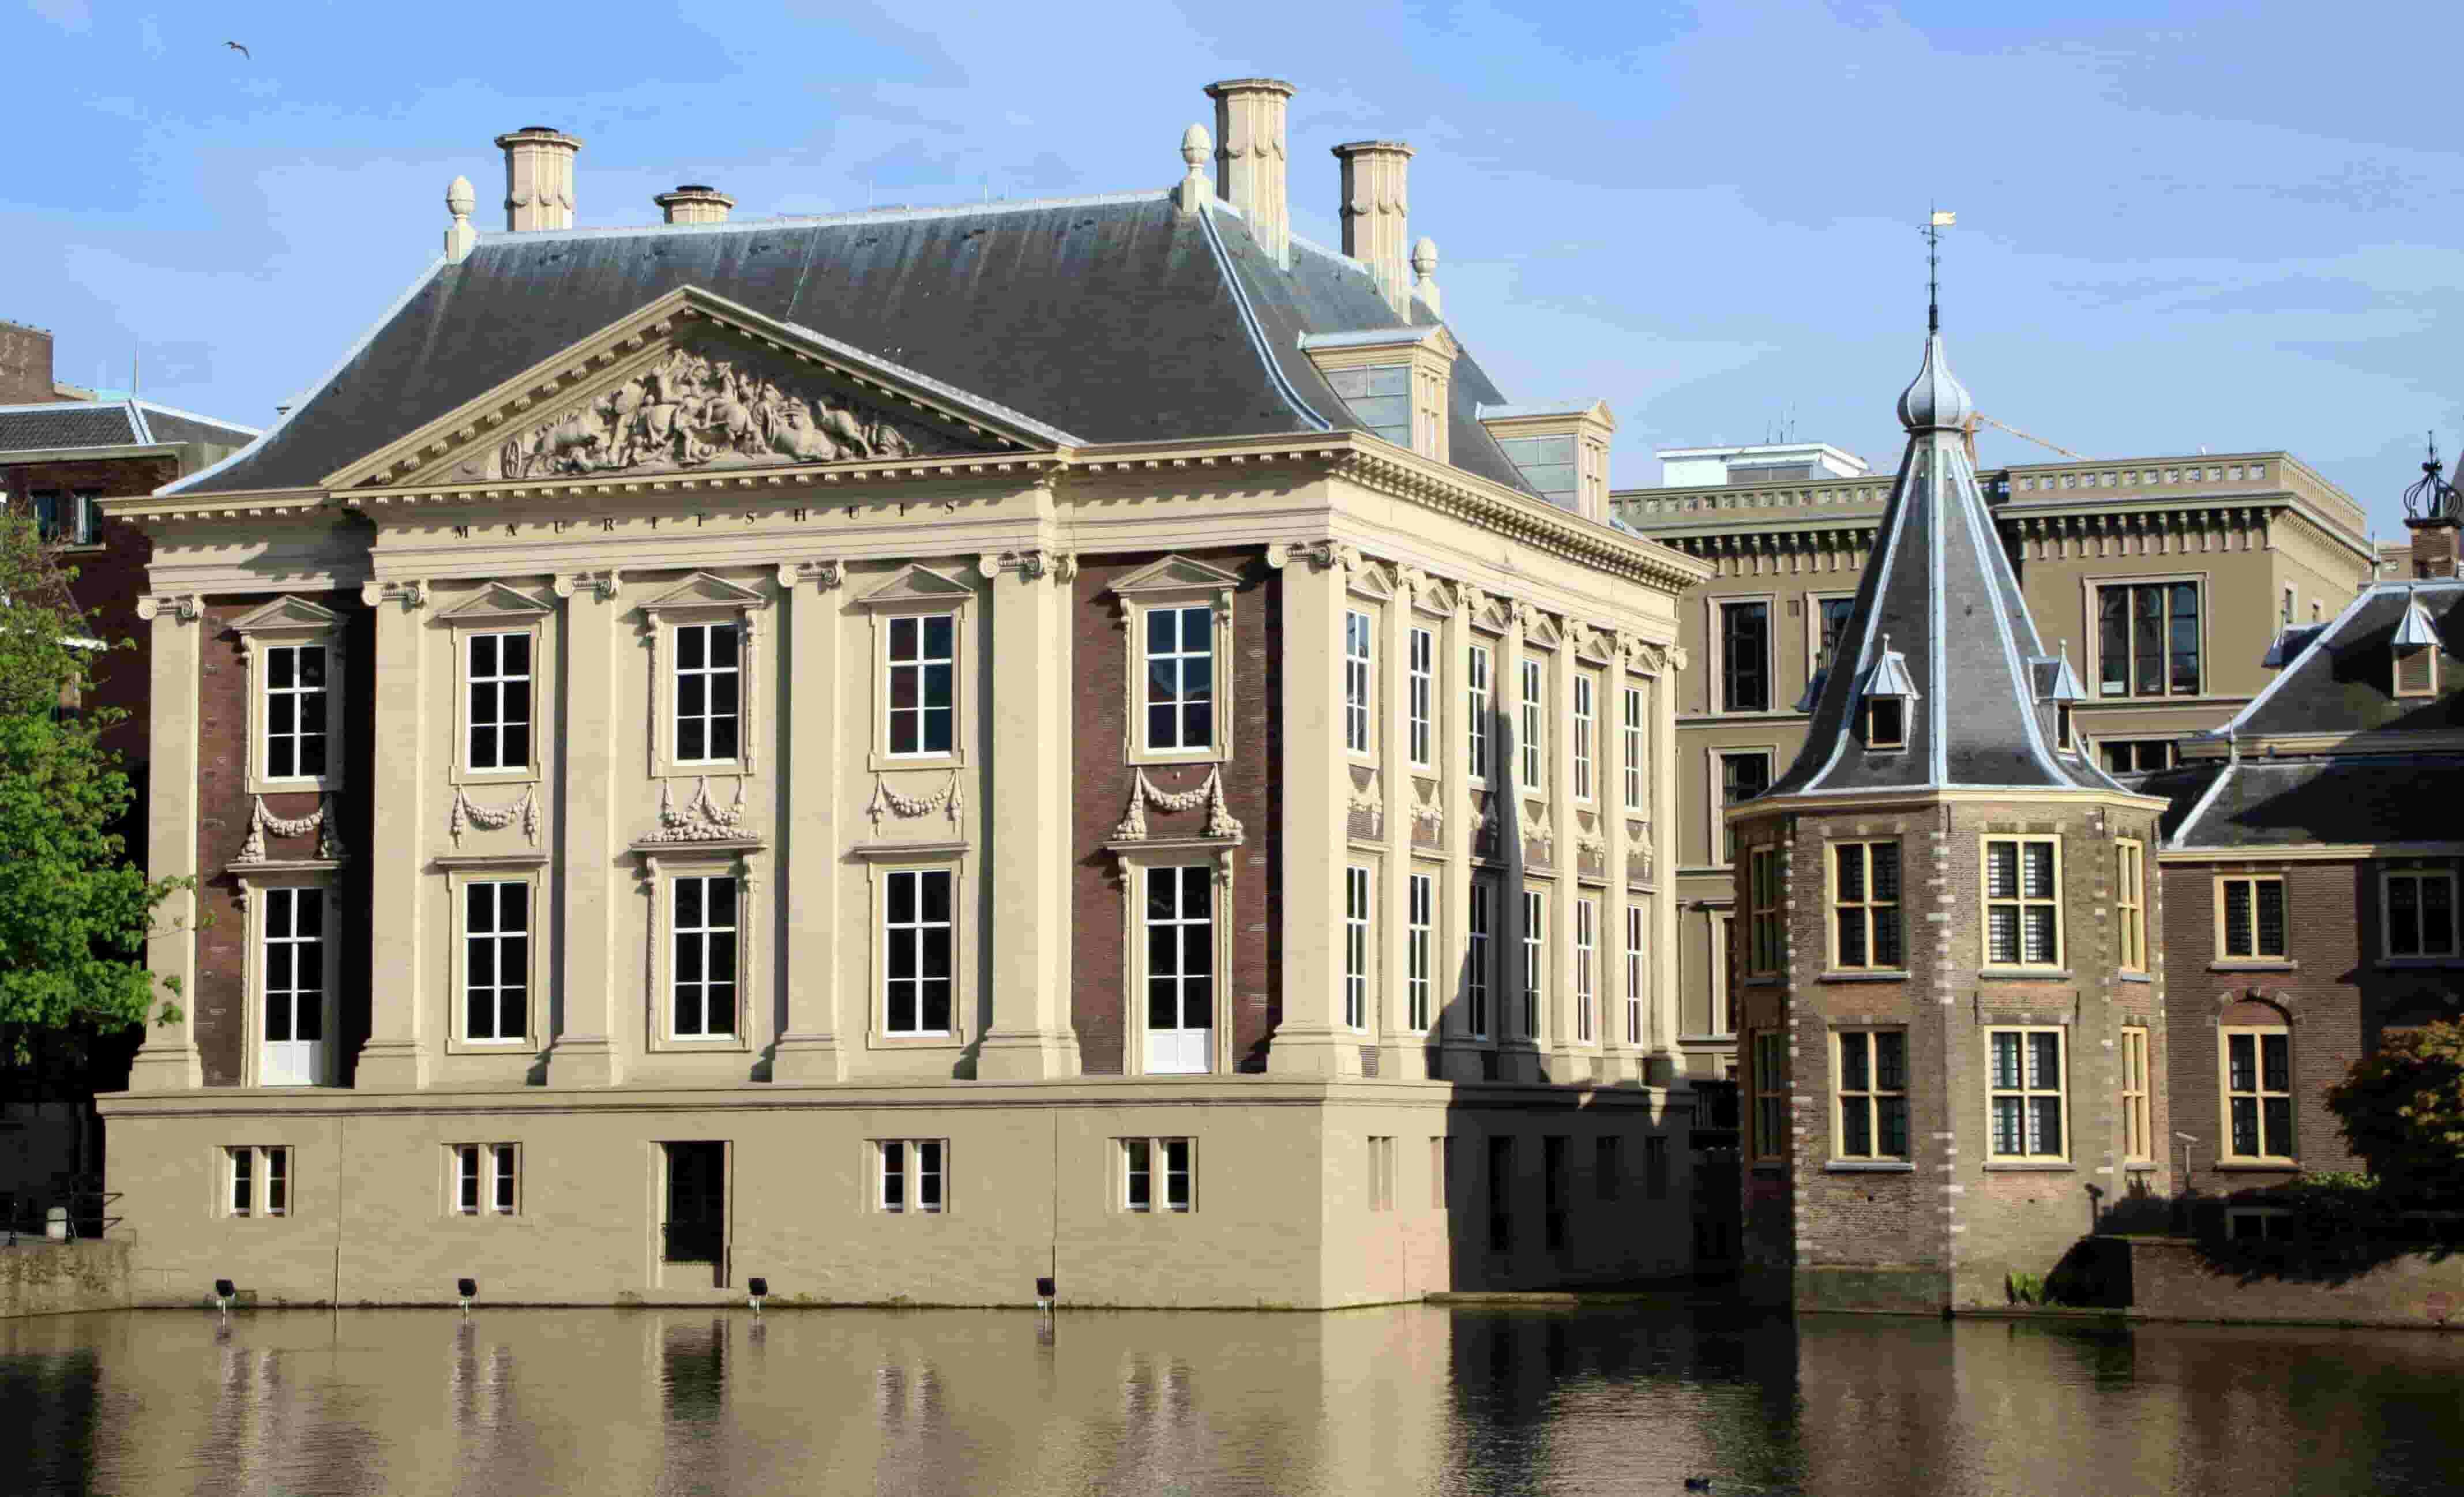 Mauritshuis in The Hague, Netherlands